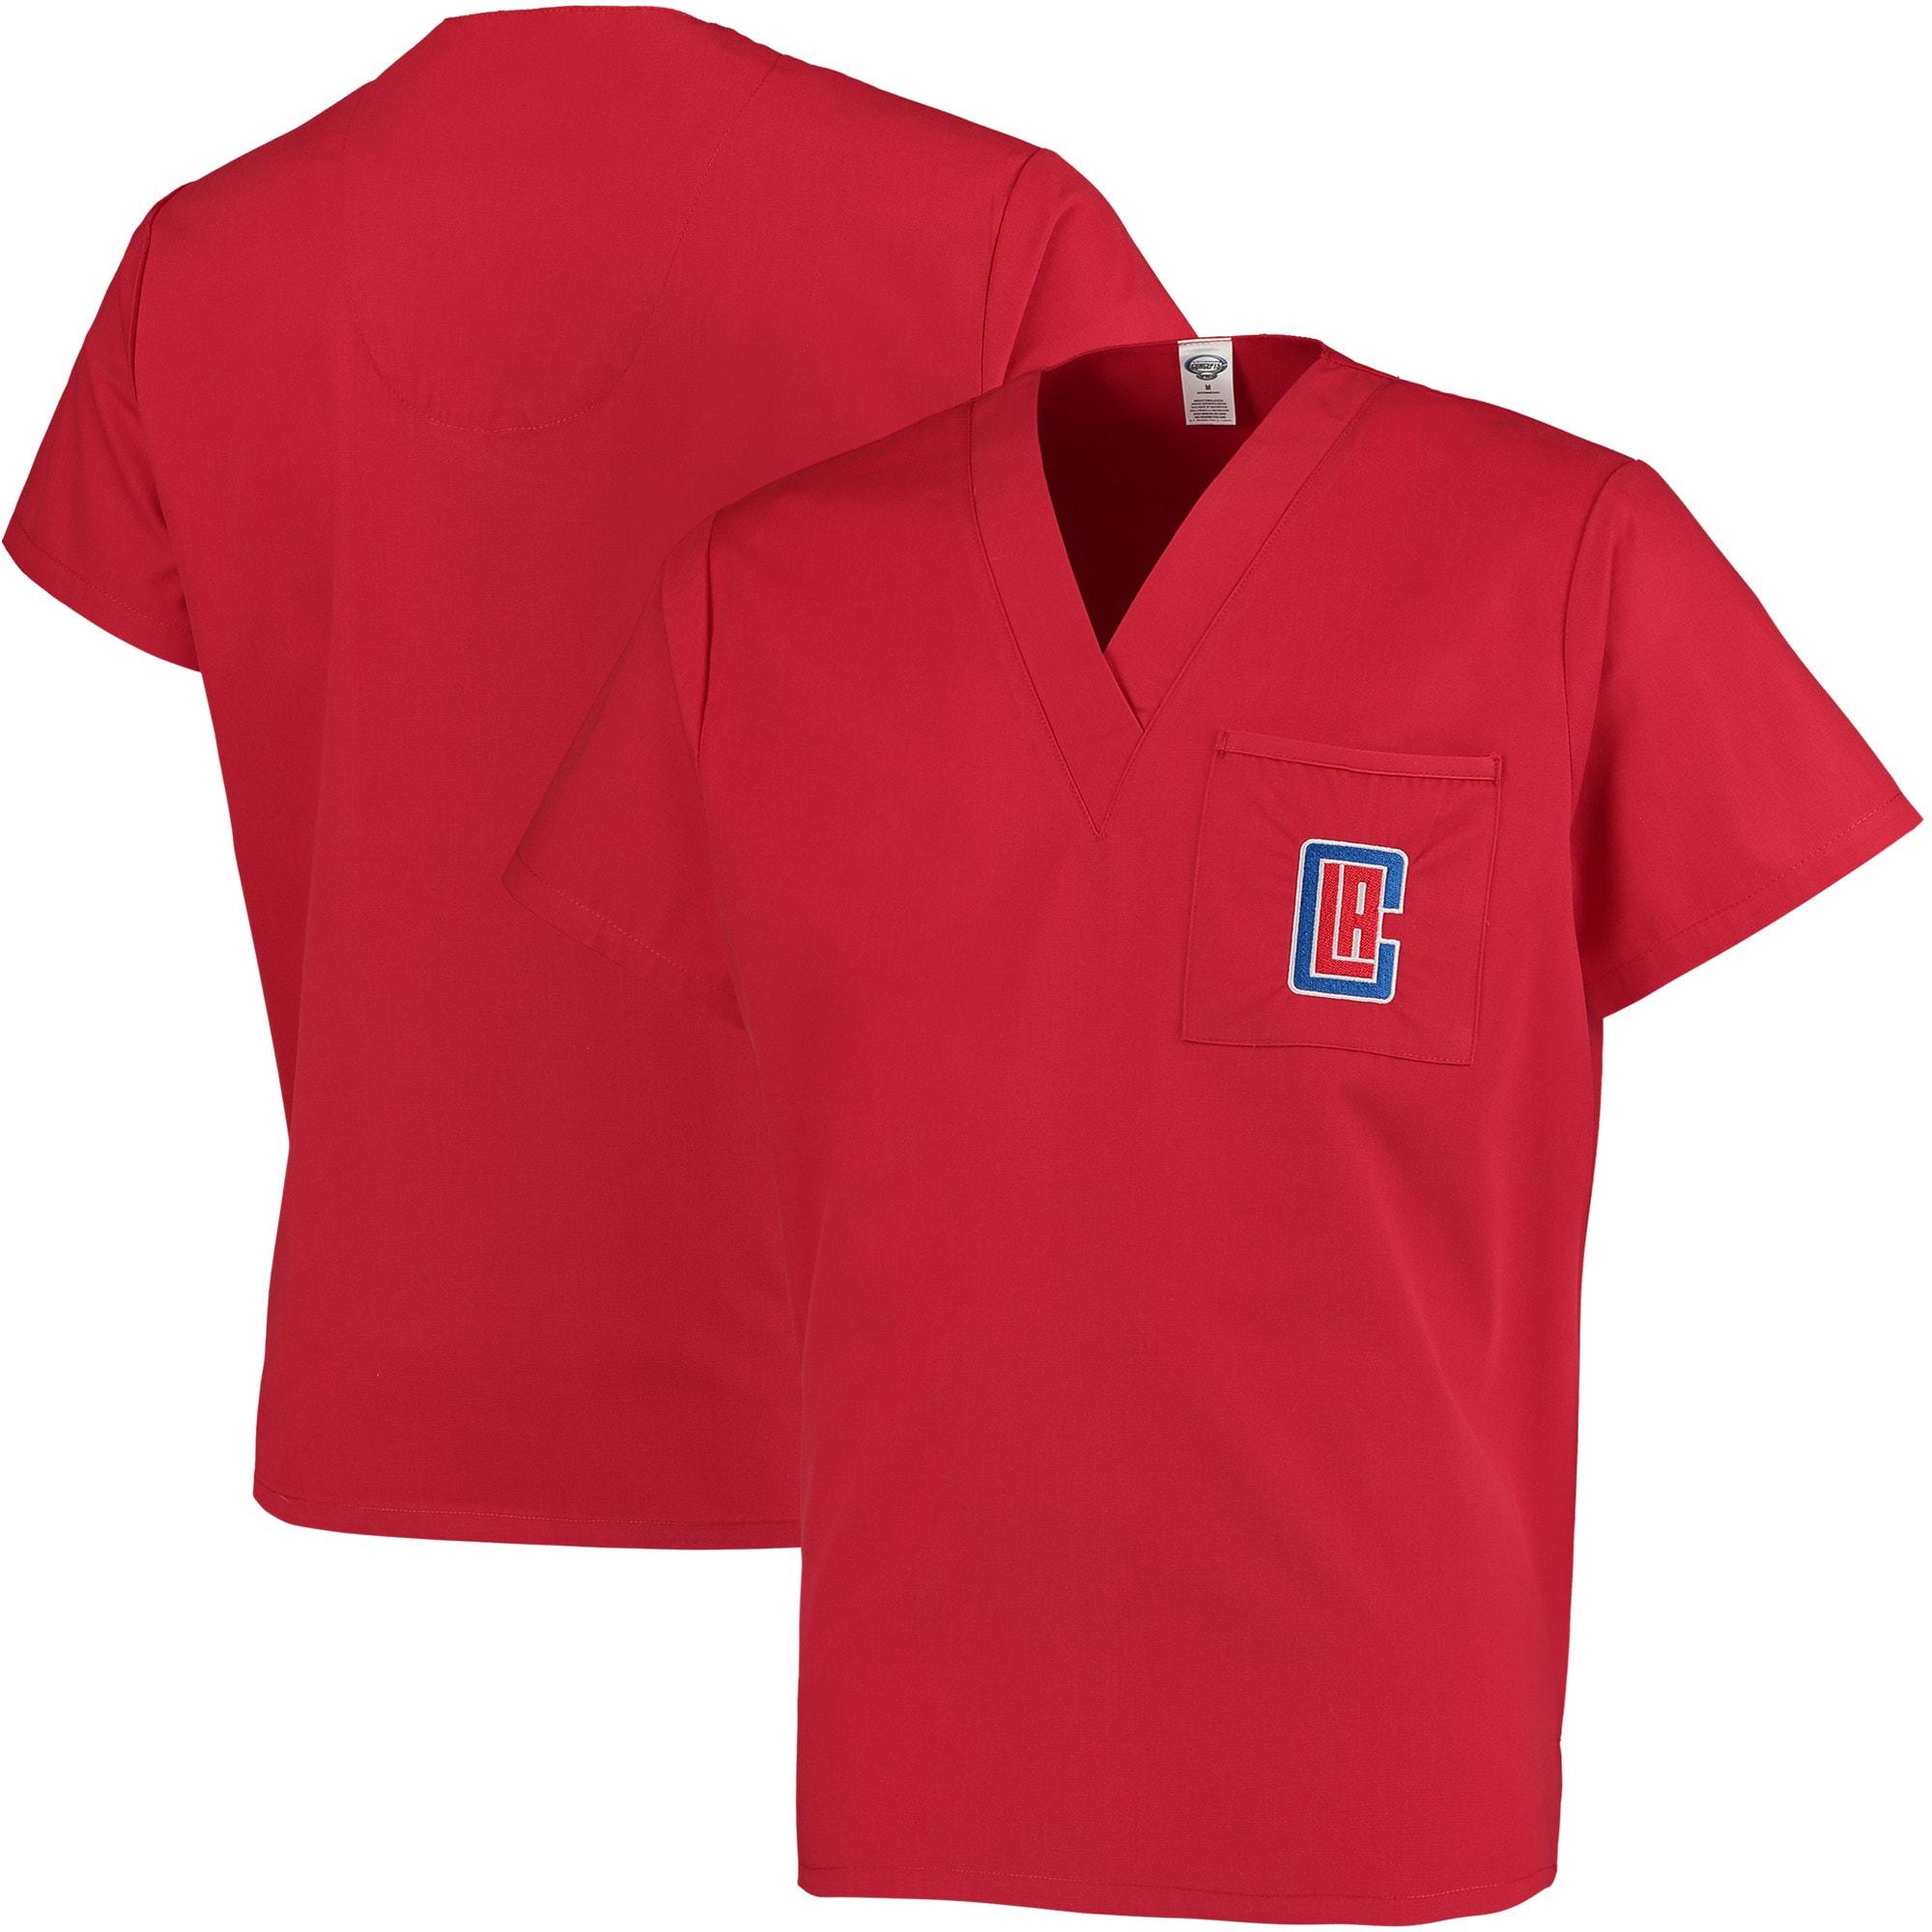 LA Clippers Concepts Sport Scrub Top - Red